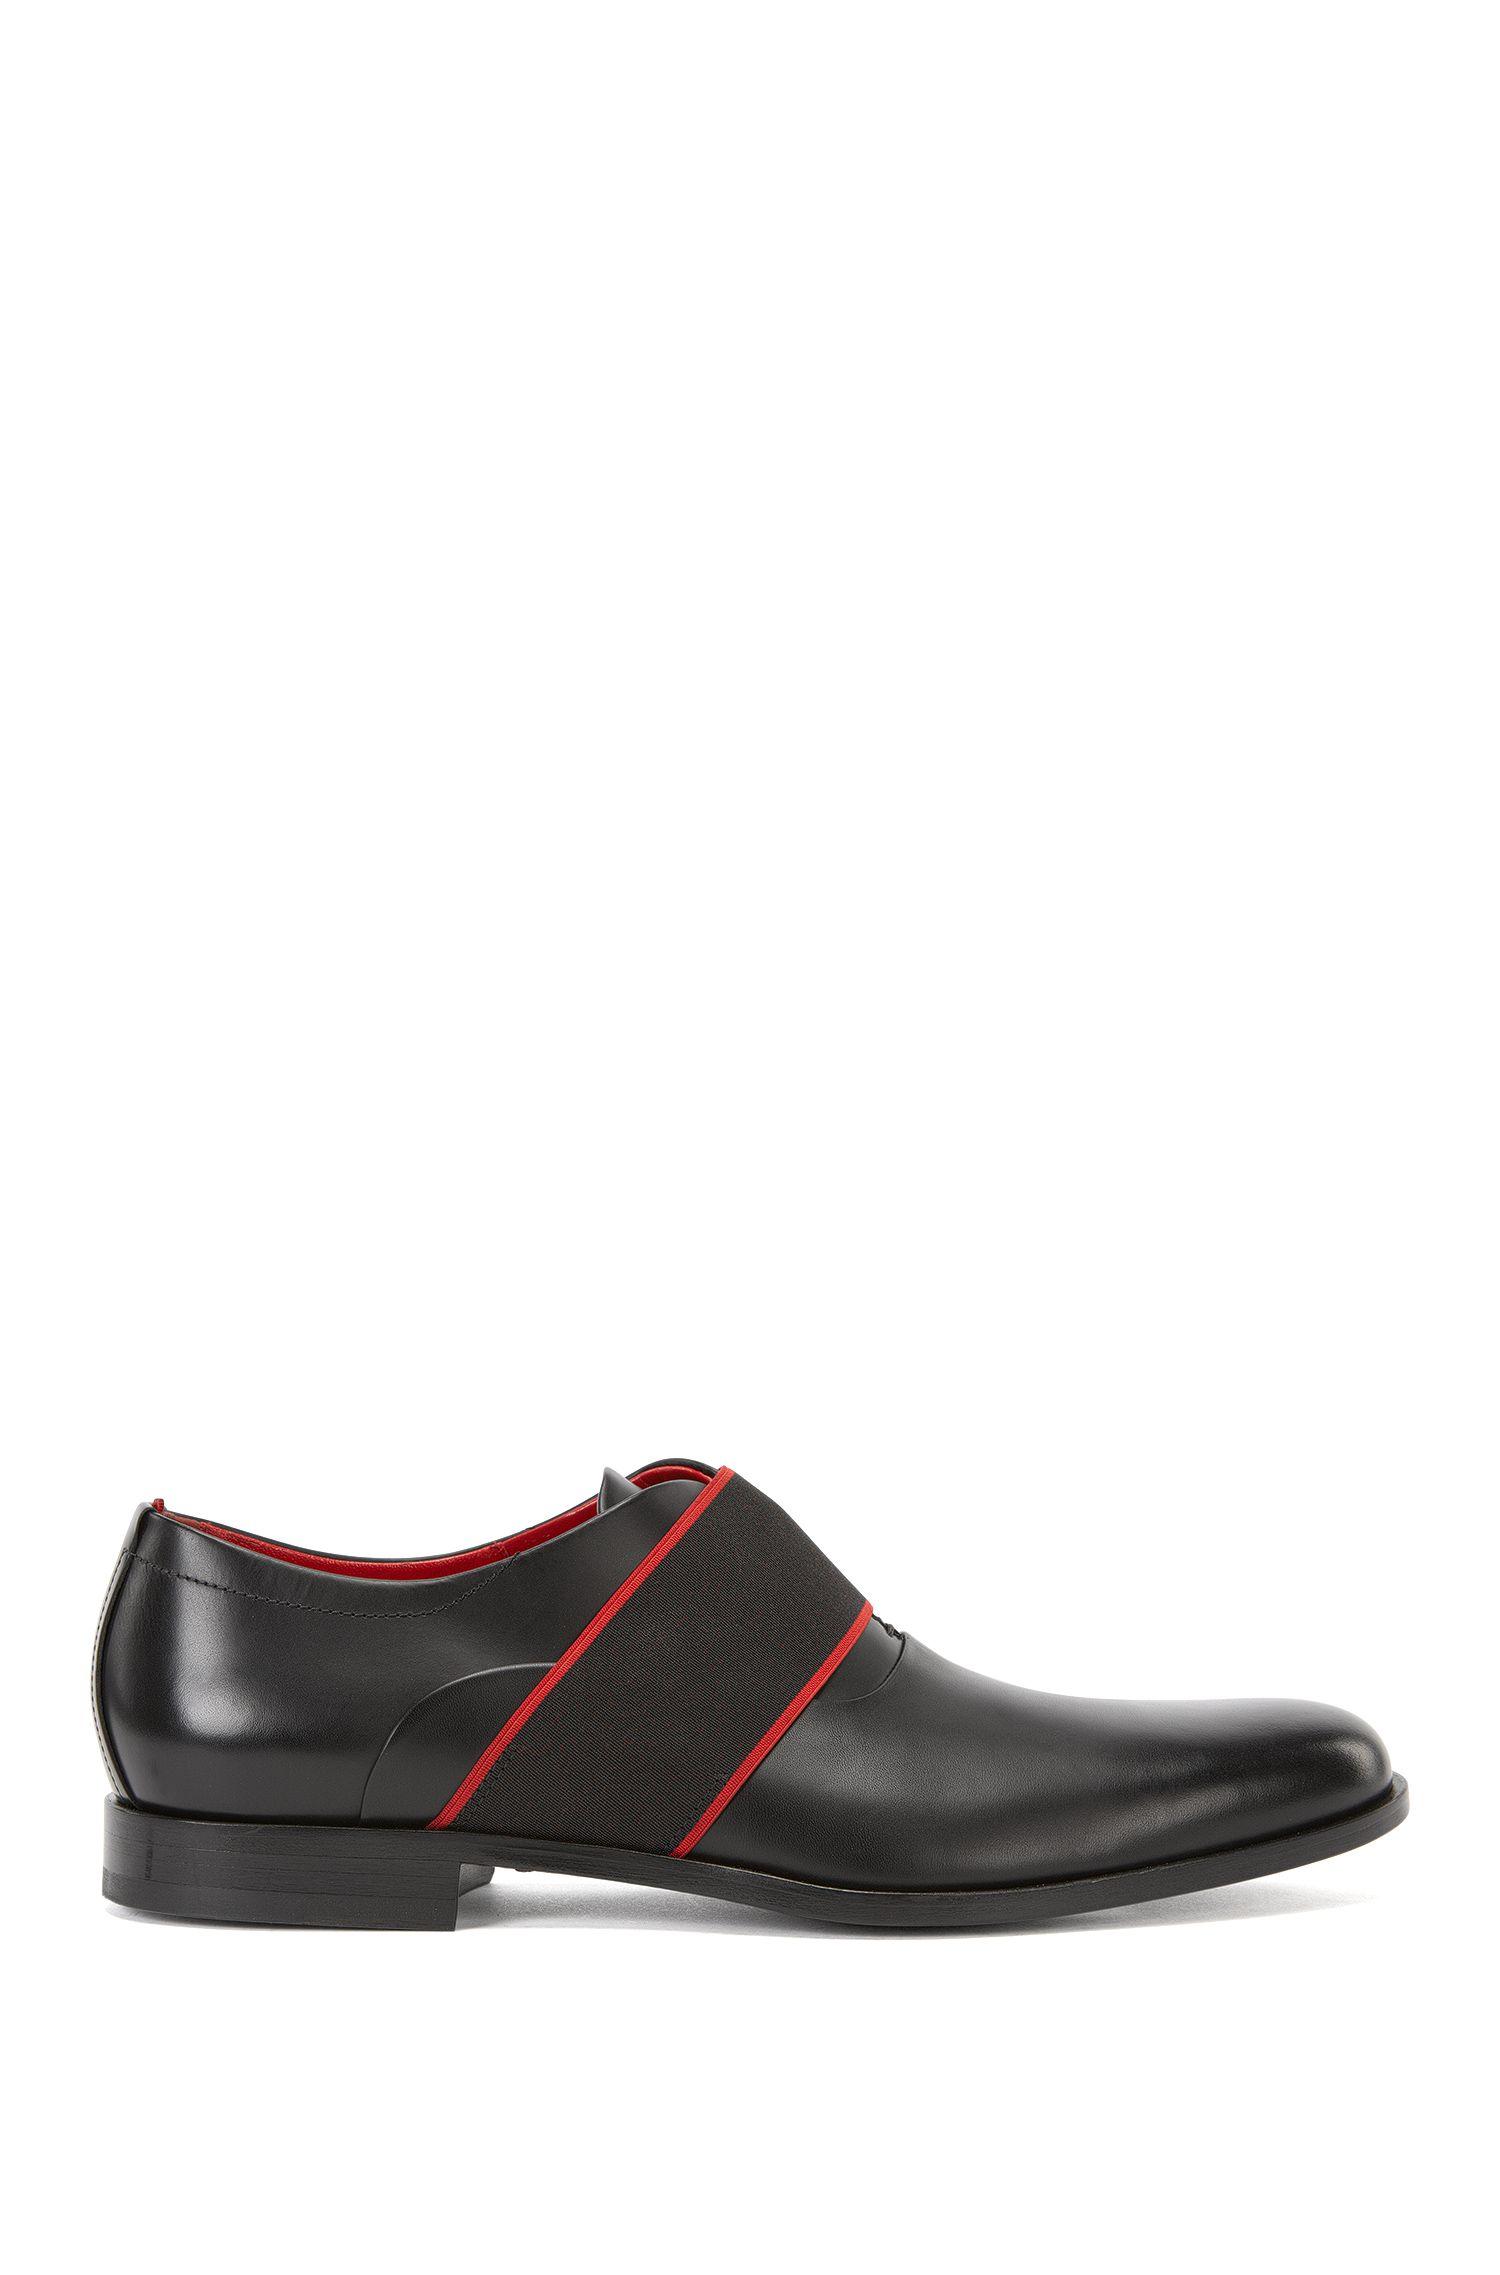 Leather Slip-On Dress Shoe | Sigma Slon Tp, Black